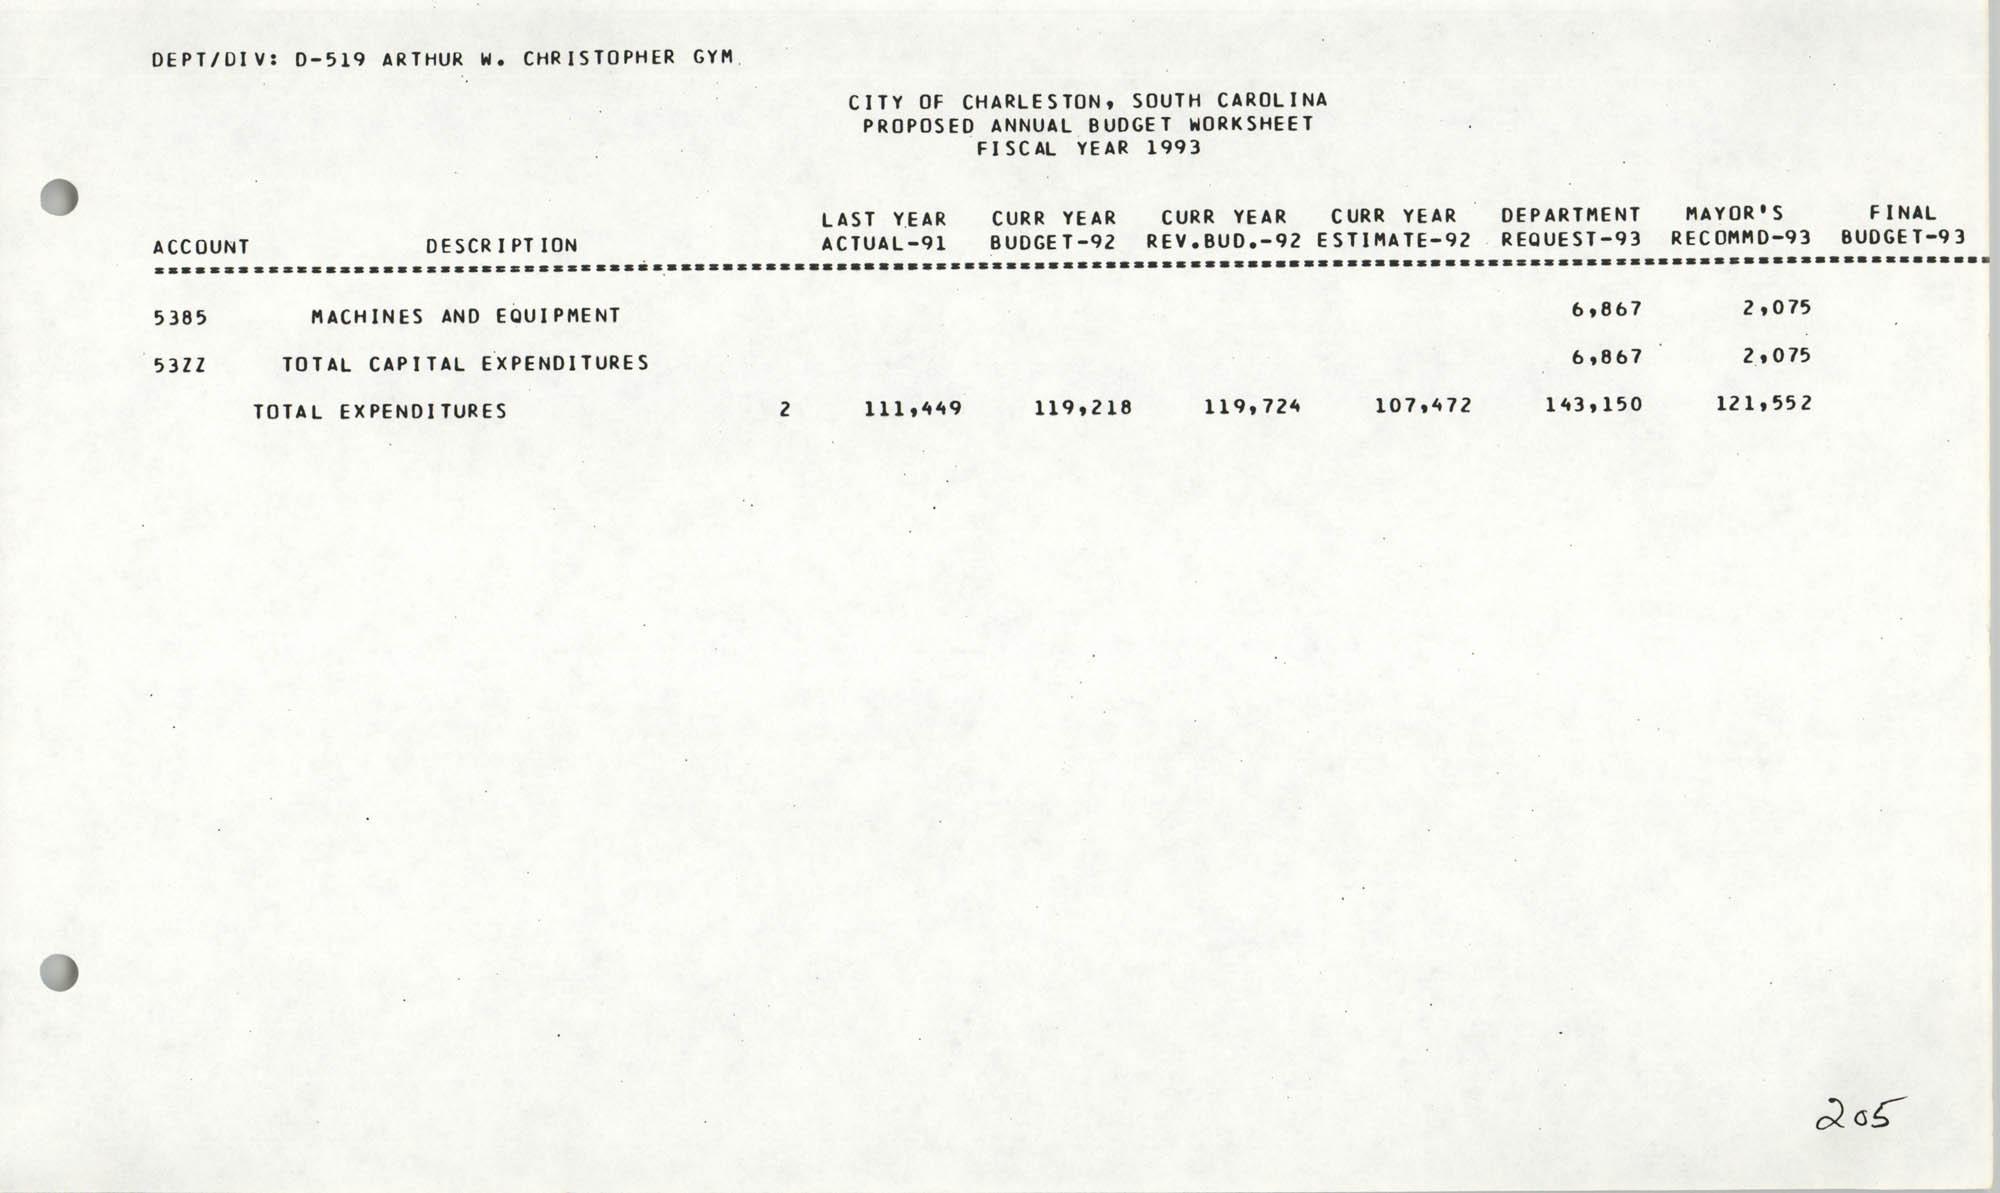 The City Council of Charleston, South Carolina, 1993 Budget, Page 205